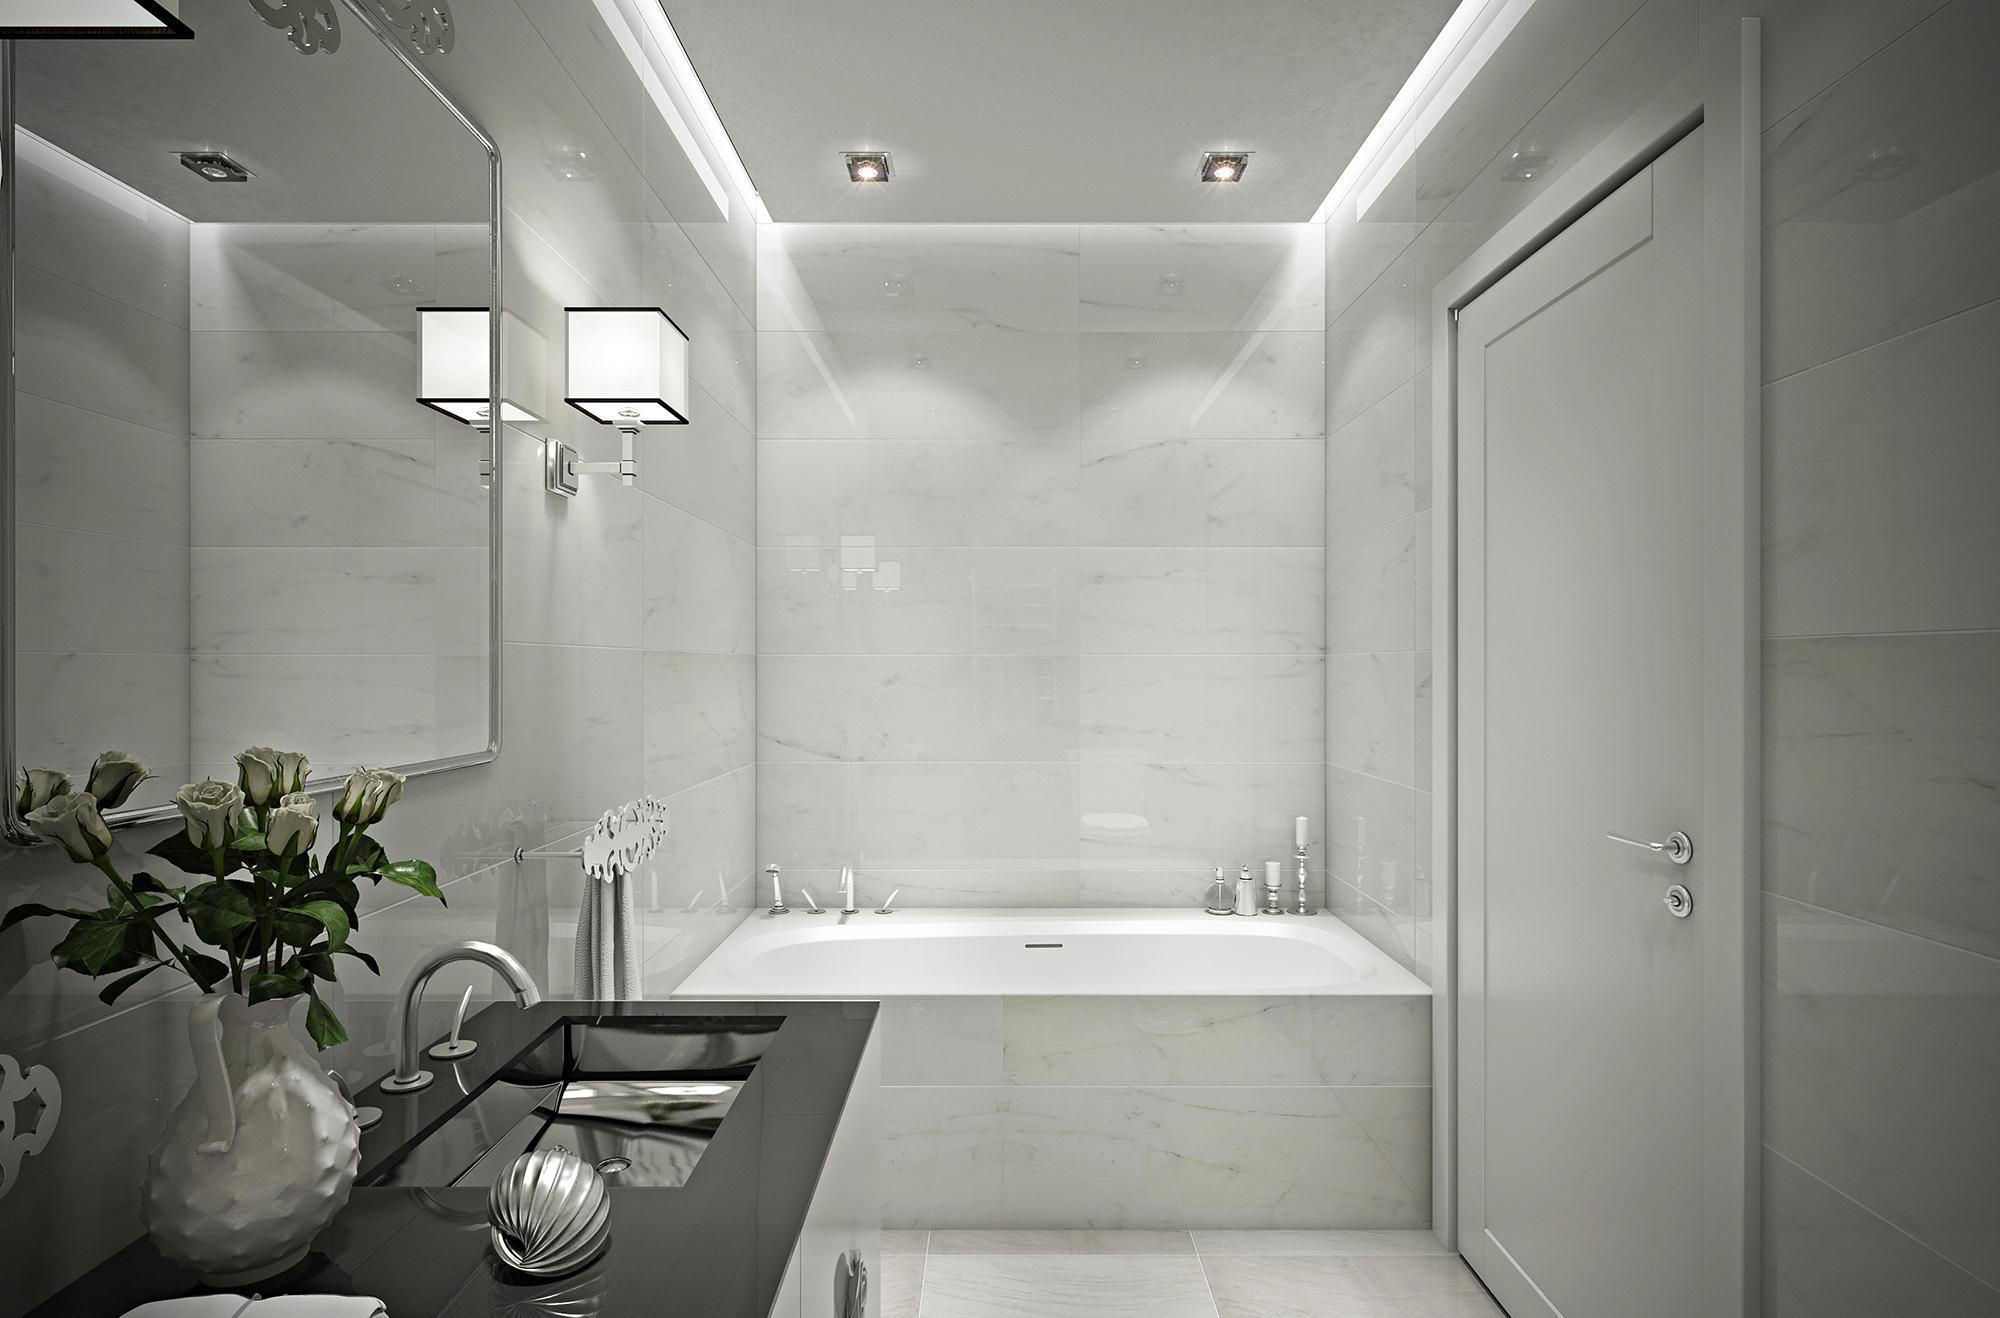 Черно-белая ванная комната без унитаза